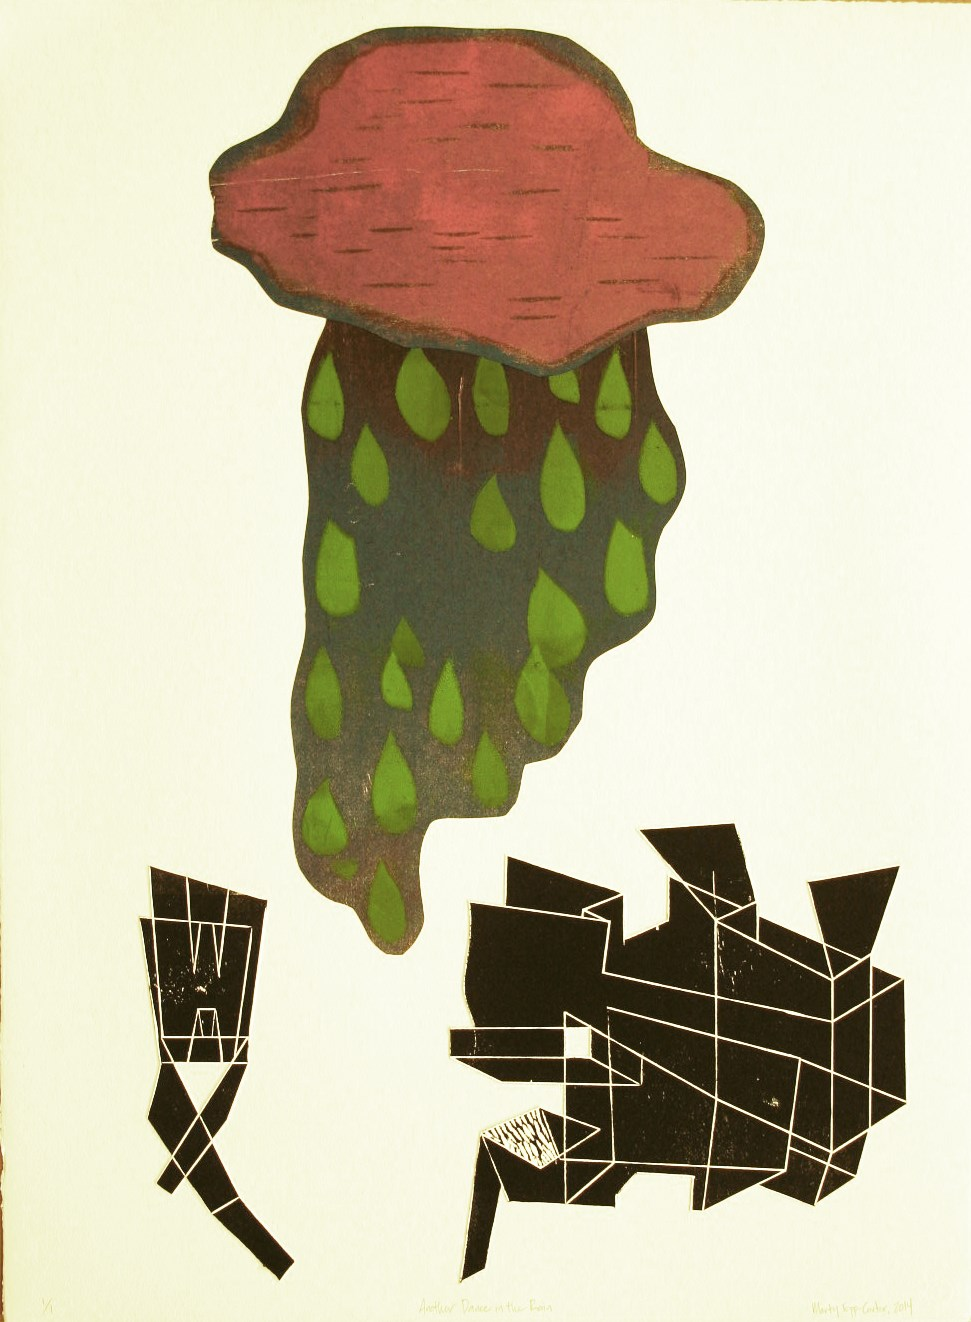 Marty Epp-Carter, Woodcut Prints